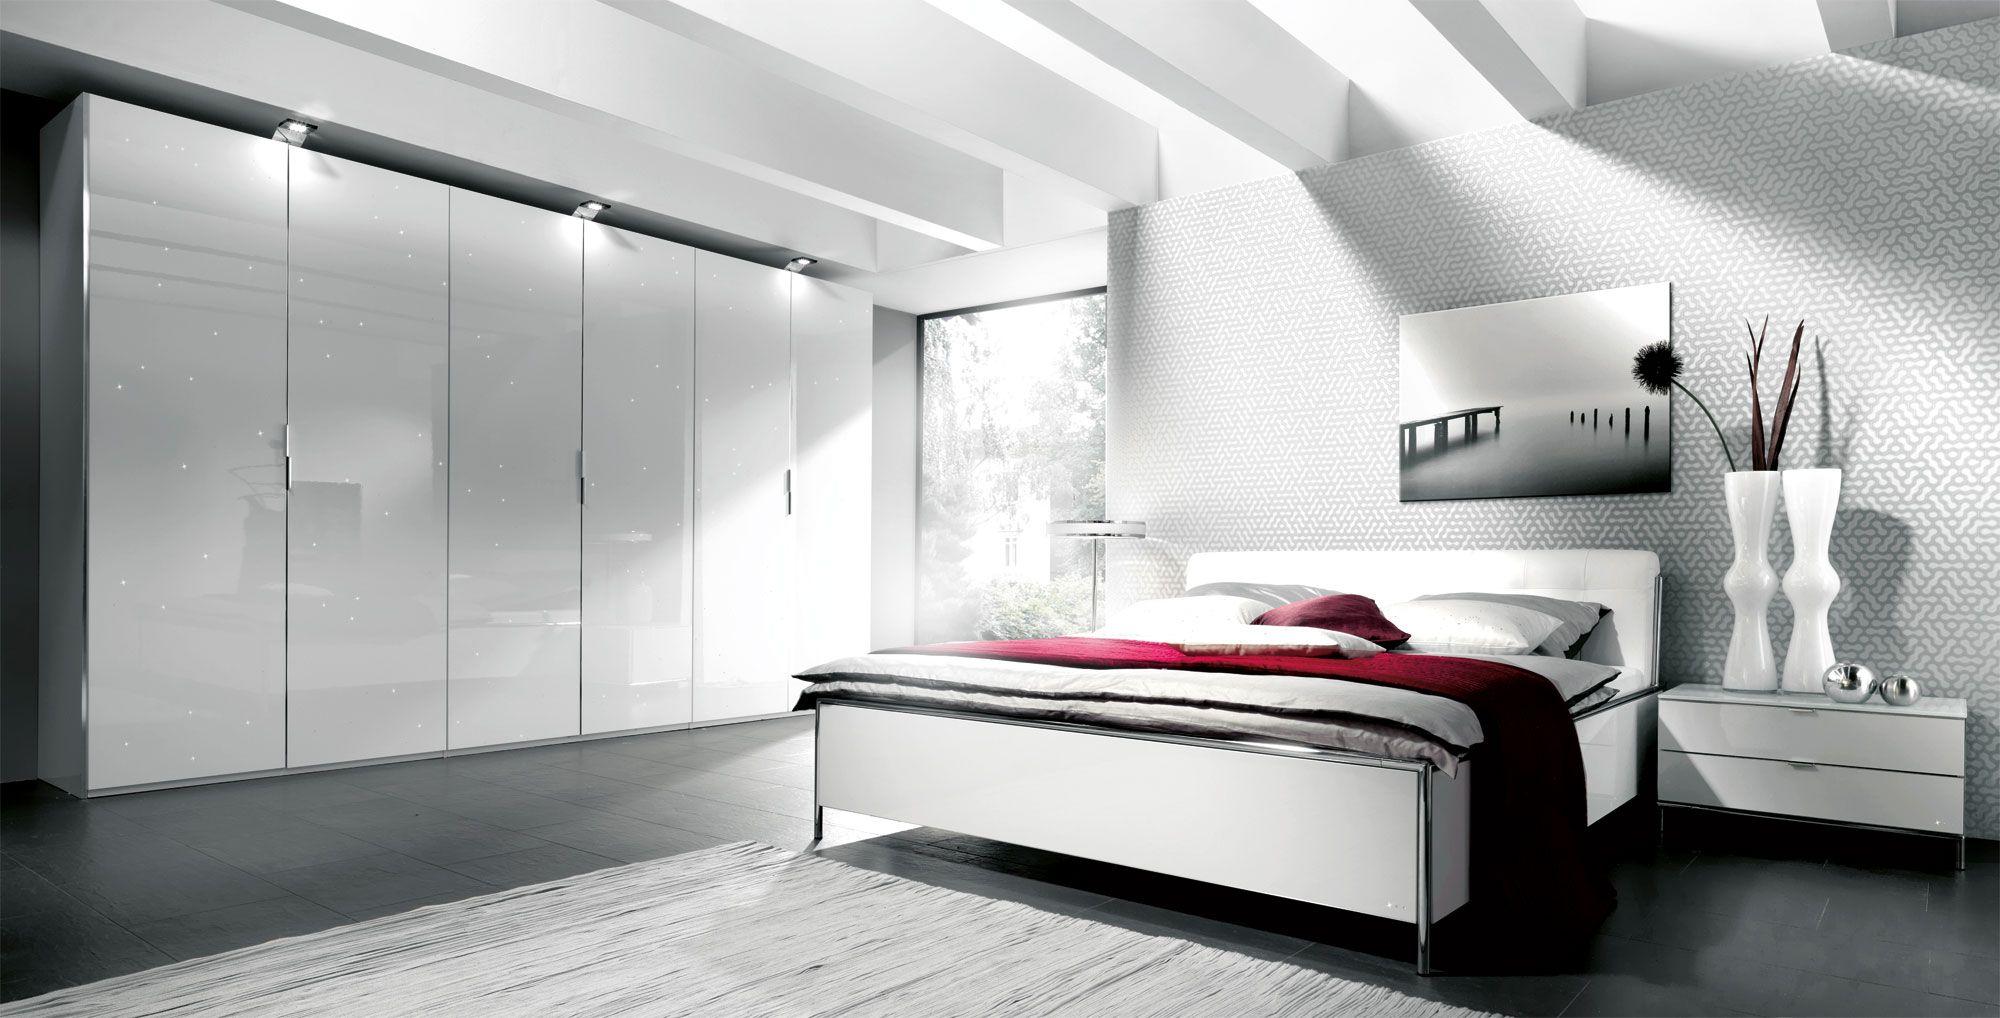 Full Size of Schlafzimmer Komplett Weiß Genial Hochglanz Weiss Wei Günstige Bett 100x200 Regale Schimmel Im Deckenlampe Big Sofa Wandlampe Betten Rauch Komplette Günstig Schlafzimmer Schlafzimmer Komplett Weiß